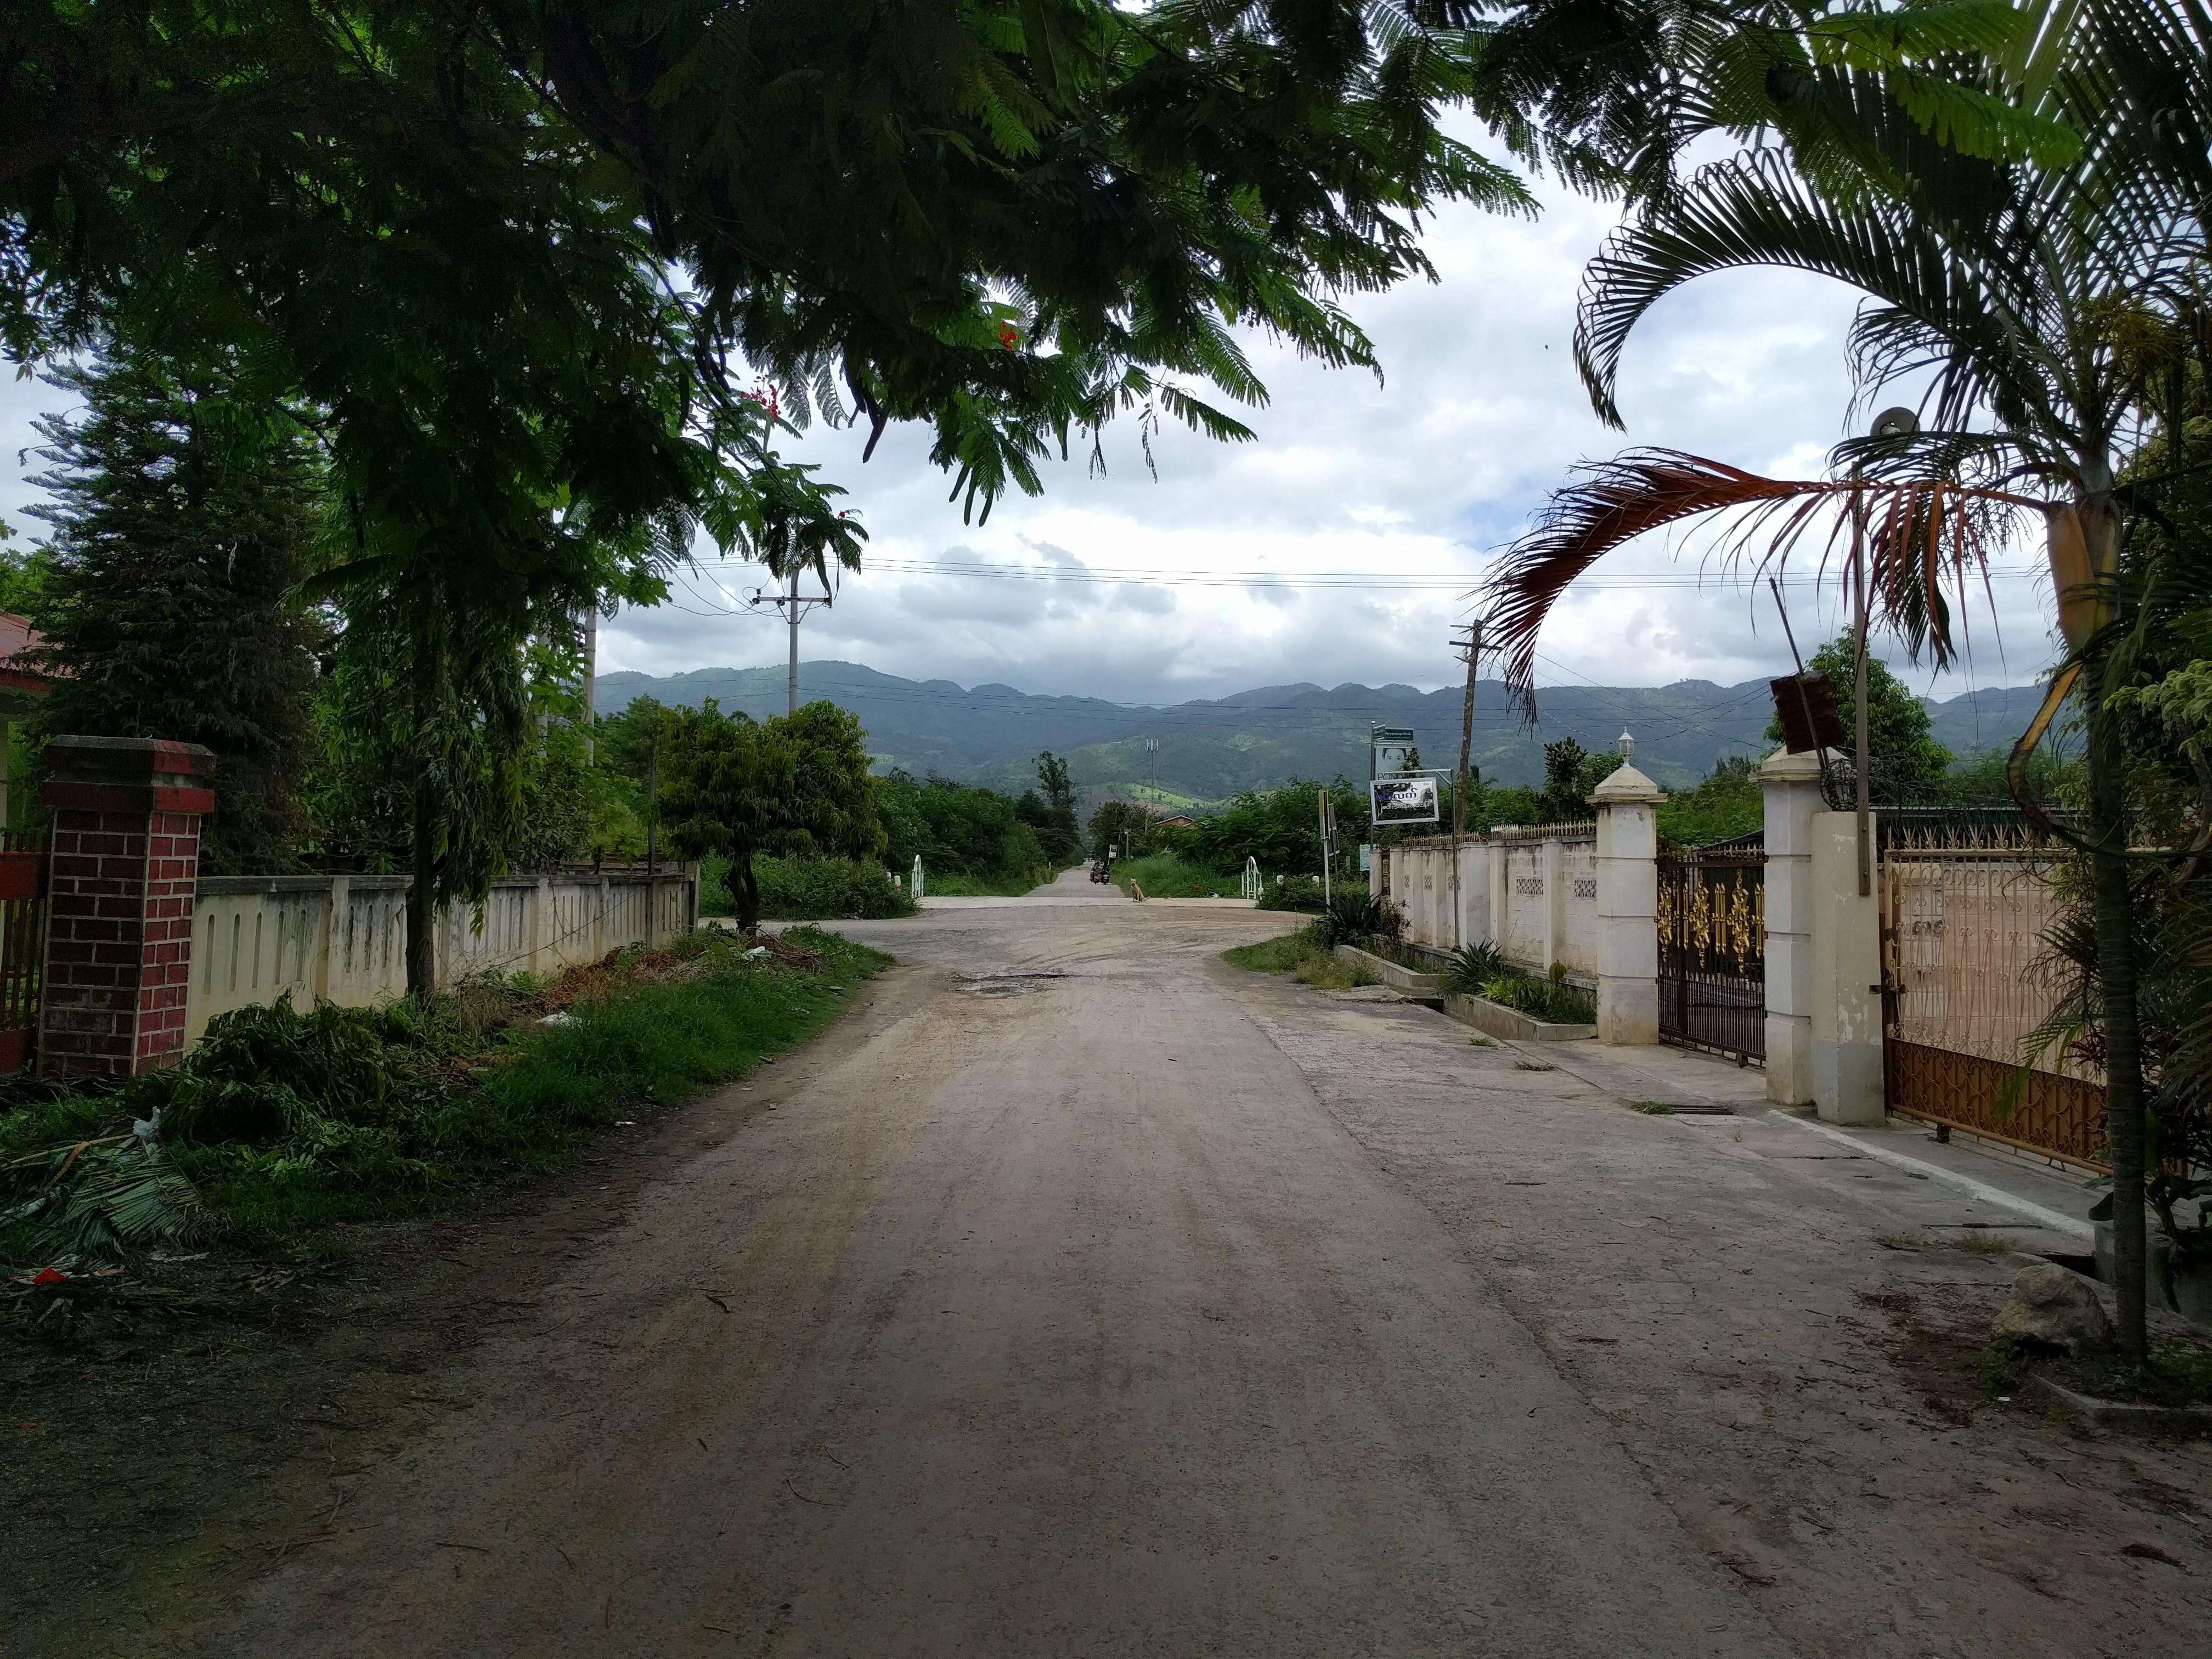 Nyaung shwe rue